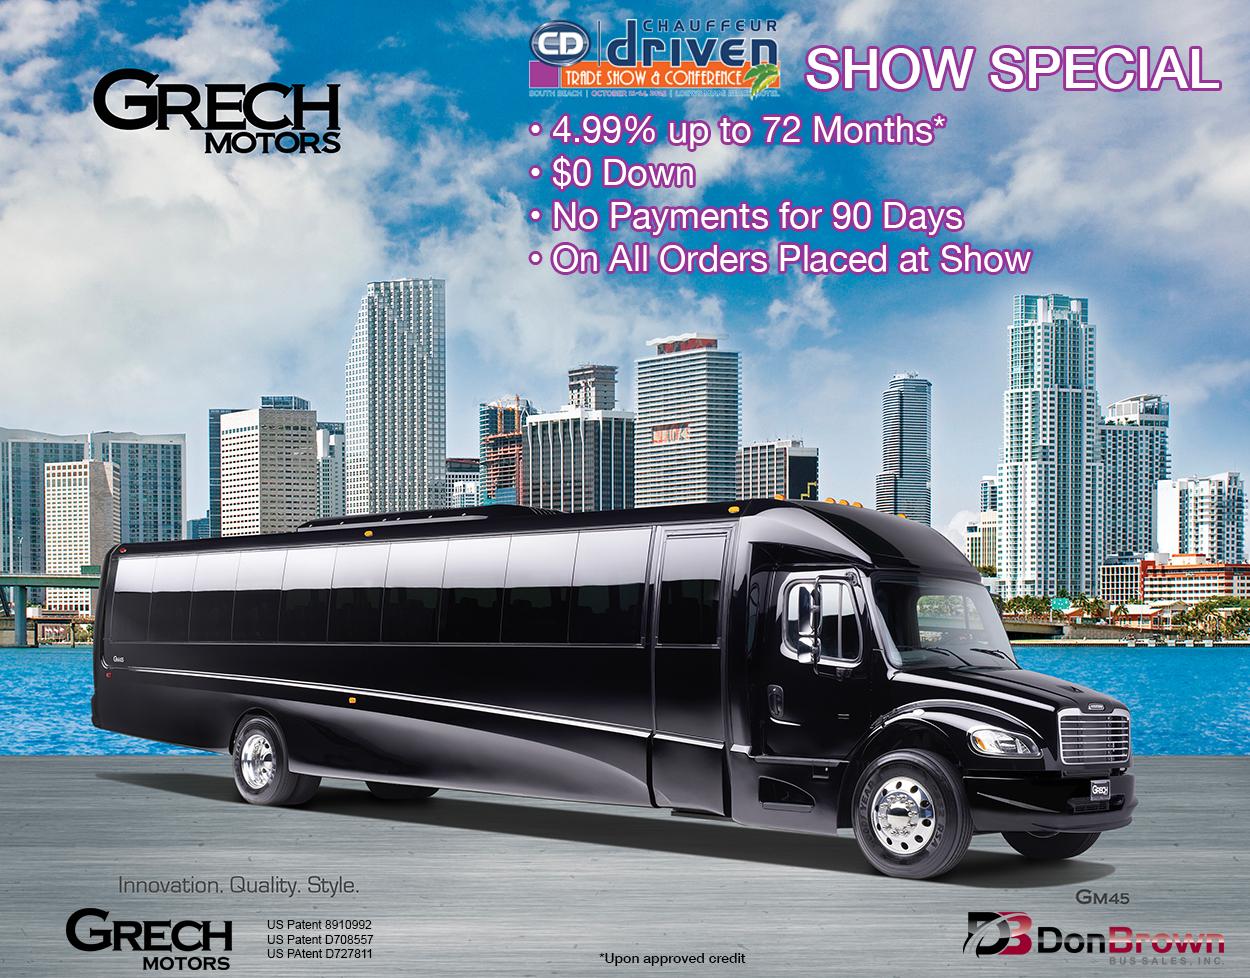 Grech Motors GM40 Chauffeur Driven Show Special Miami 2015